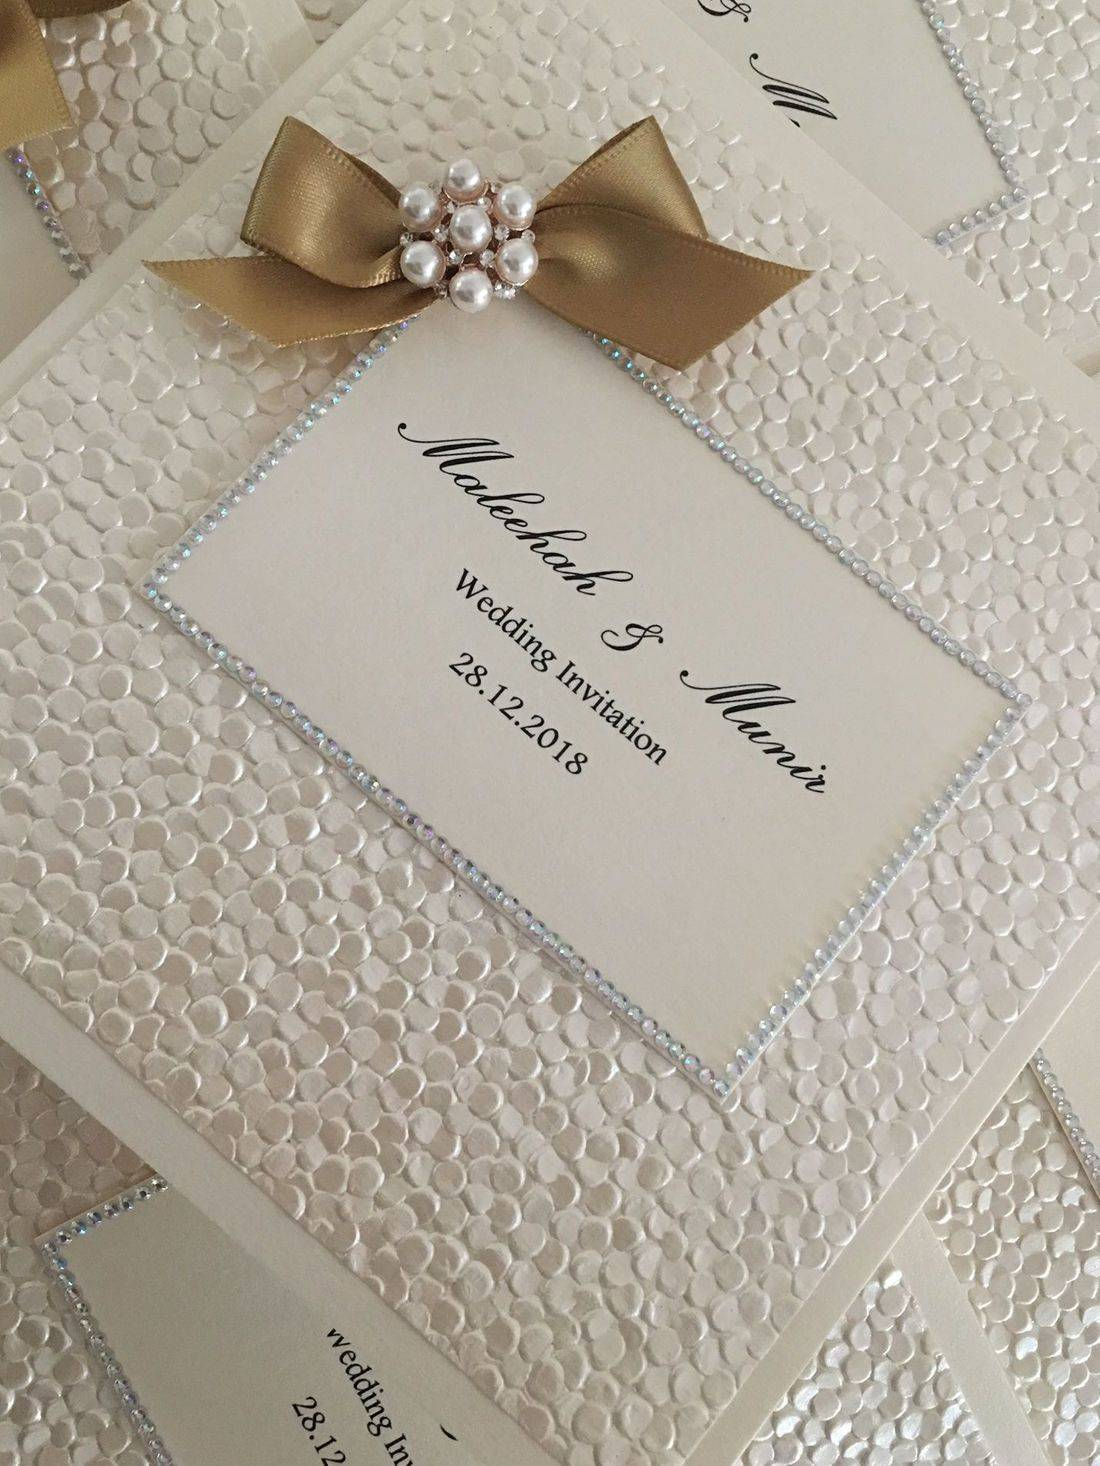 wedding invitations, luxury wedding invitations, wedding invites